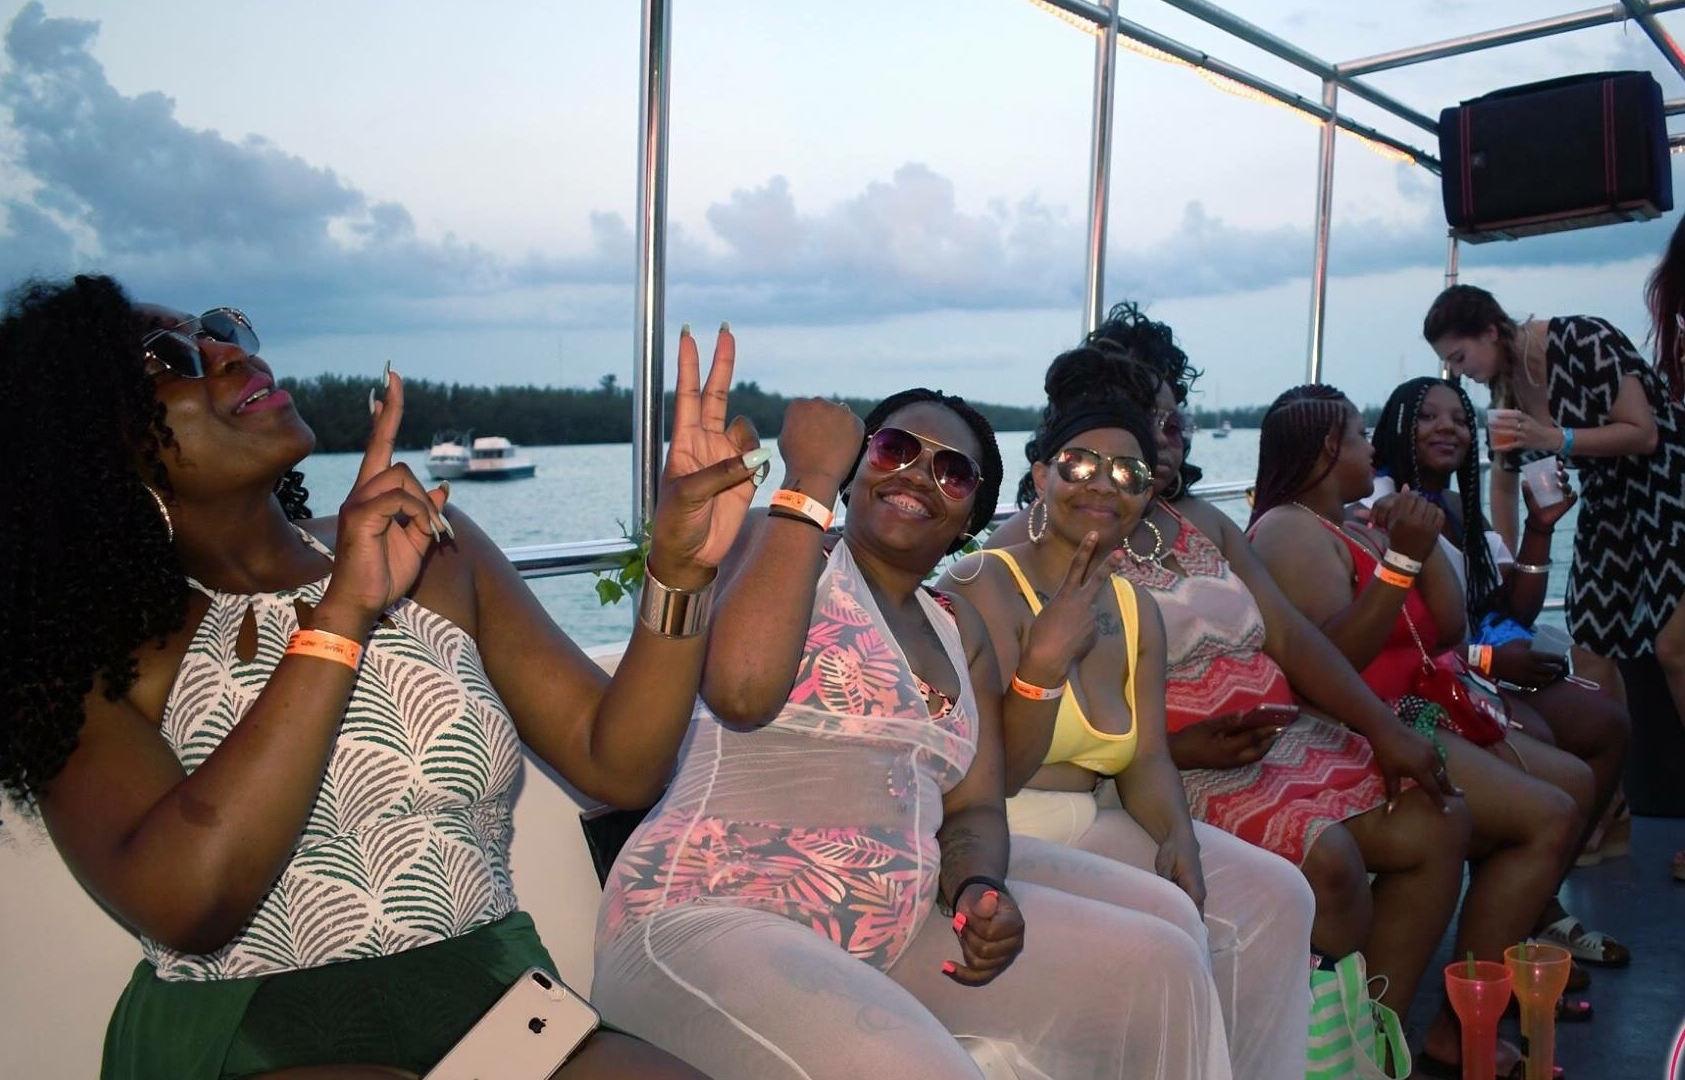 Miami Party Boat | Booze Cruise- Miami Turn Up Entertainment